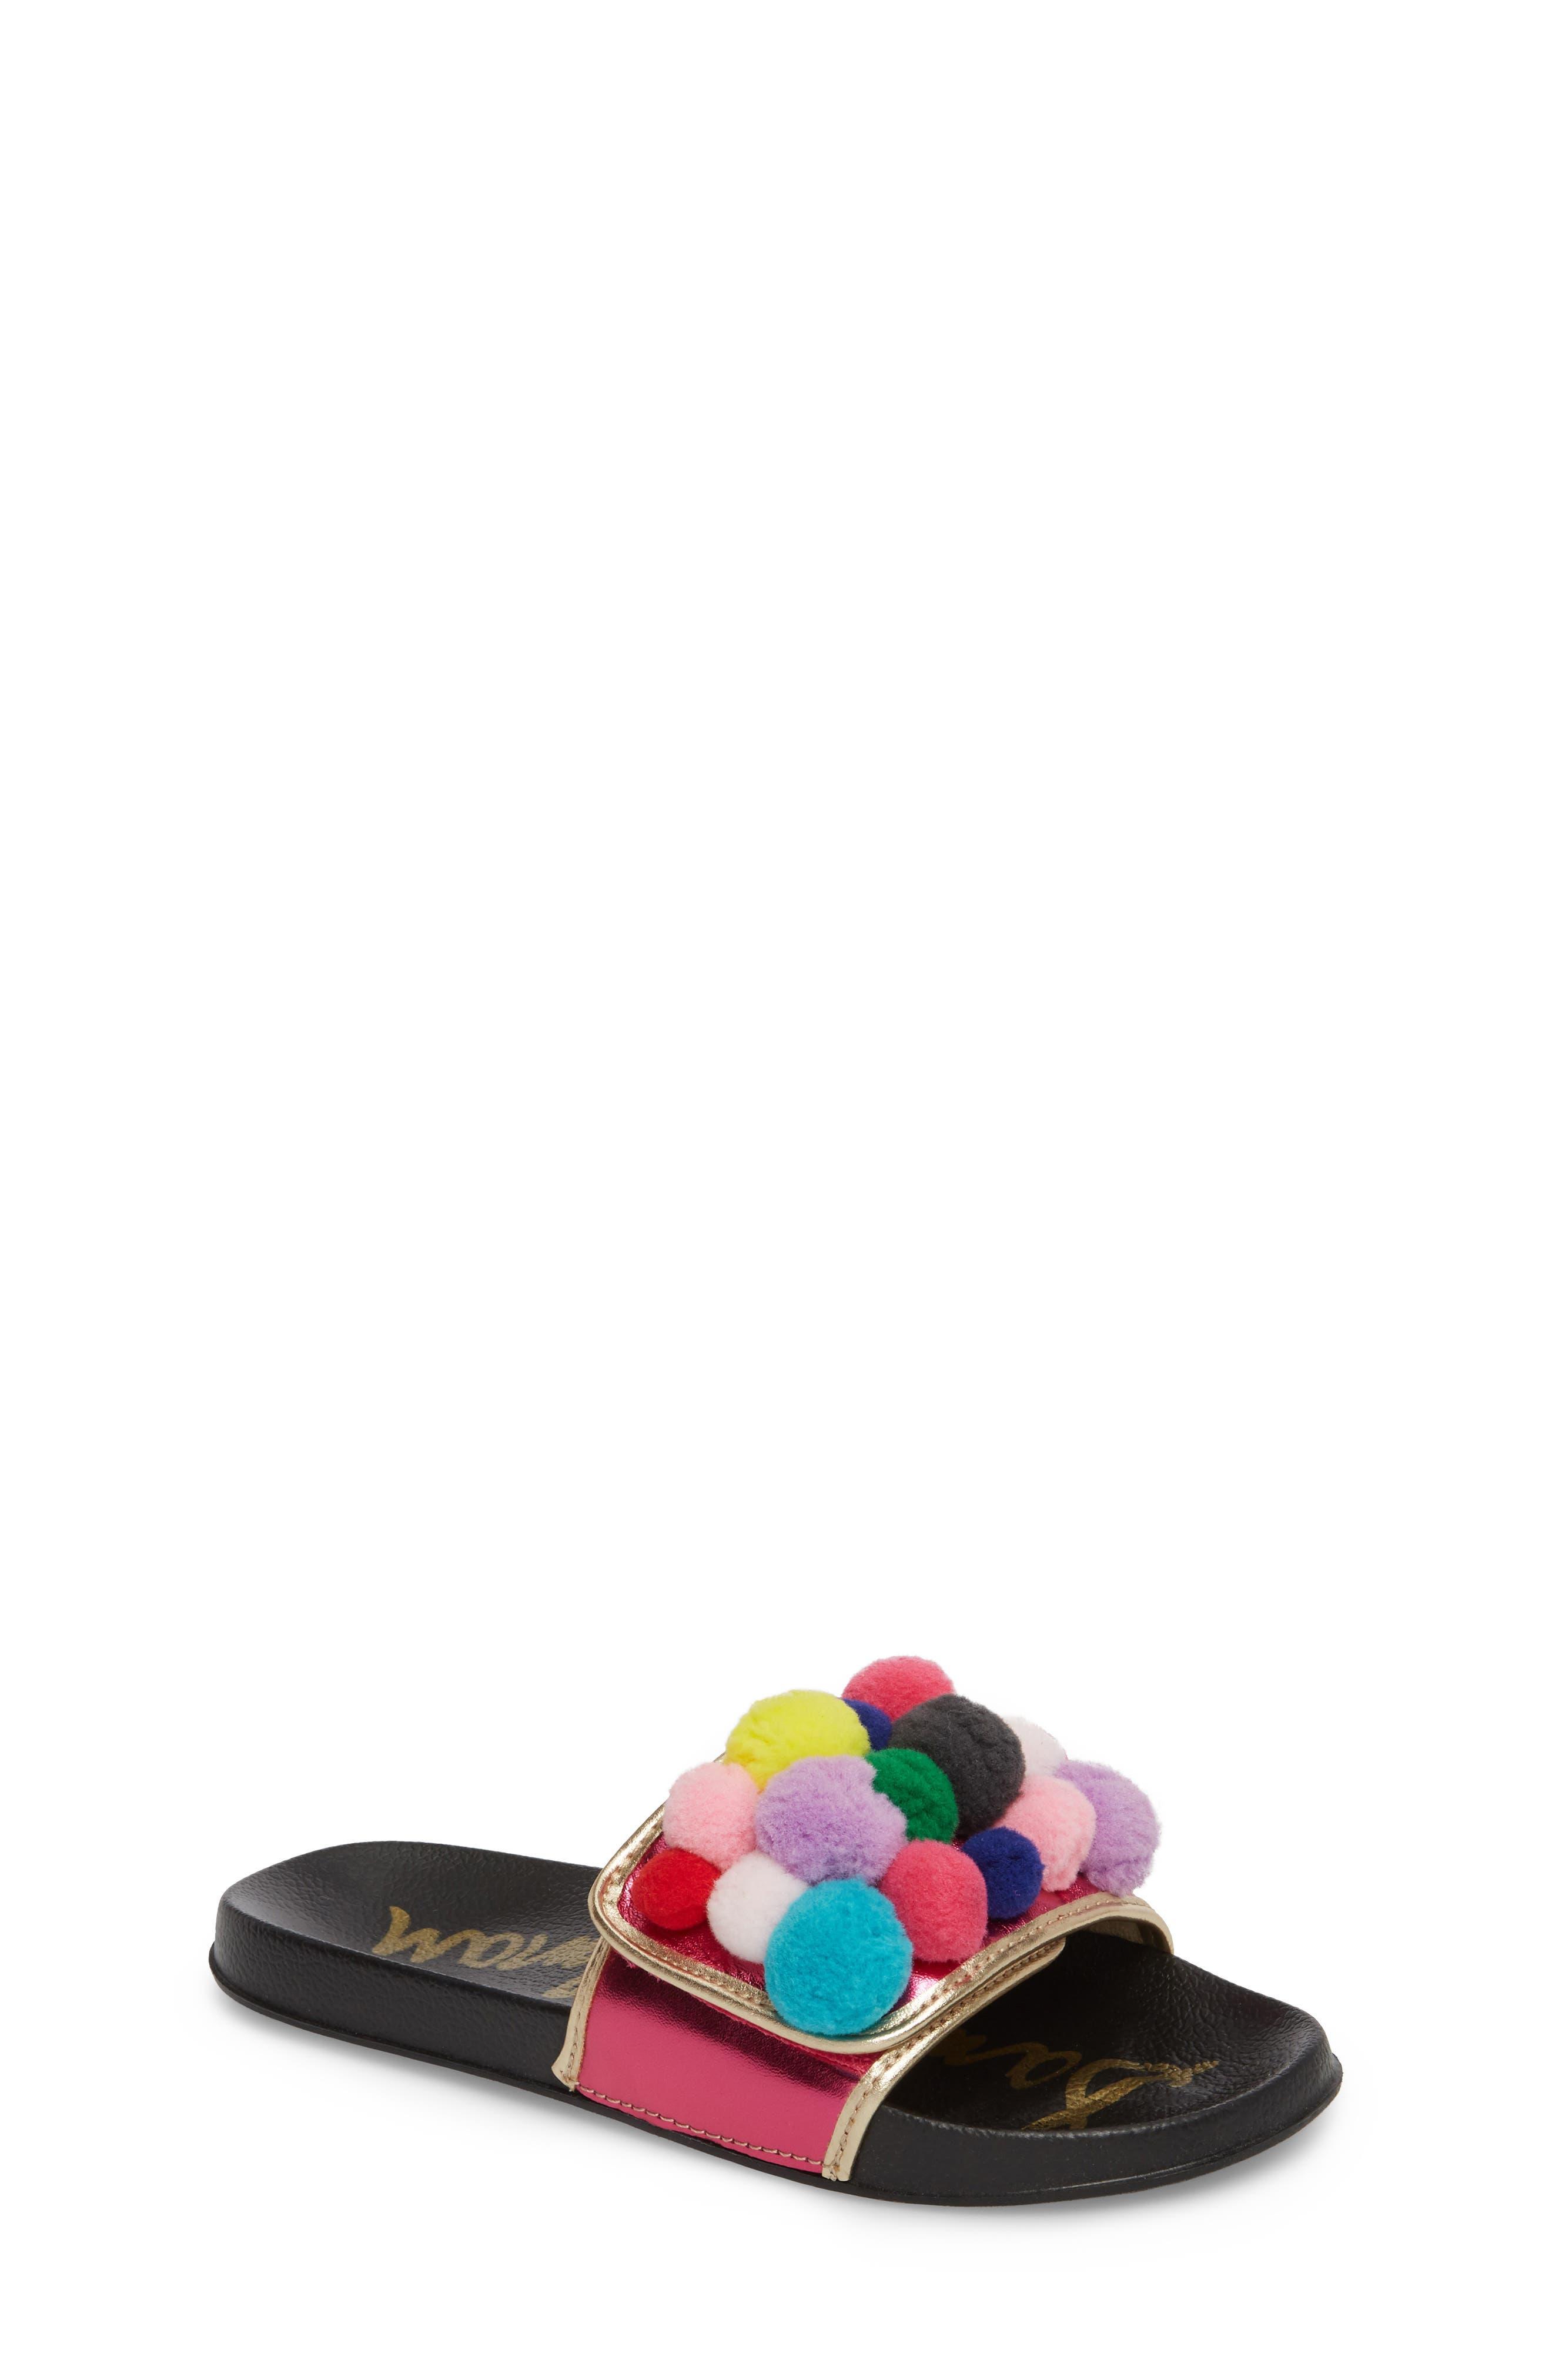 Faux Fur Mackie Cayman Sandal,                             Main thumbnail 1, color,                             697